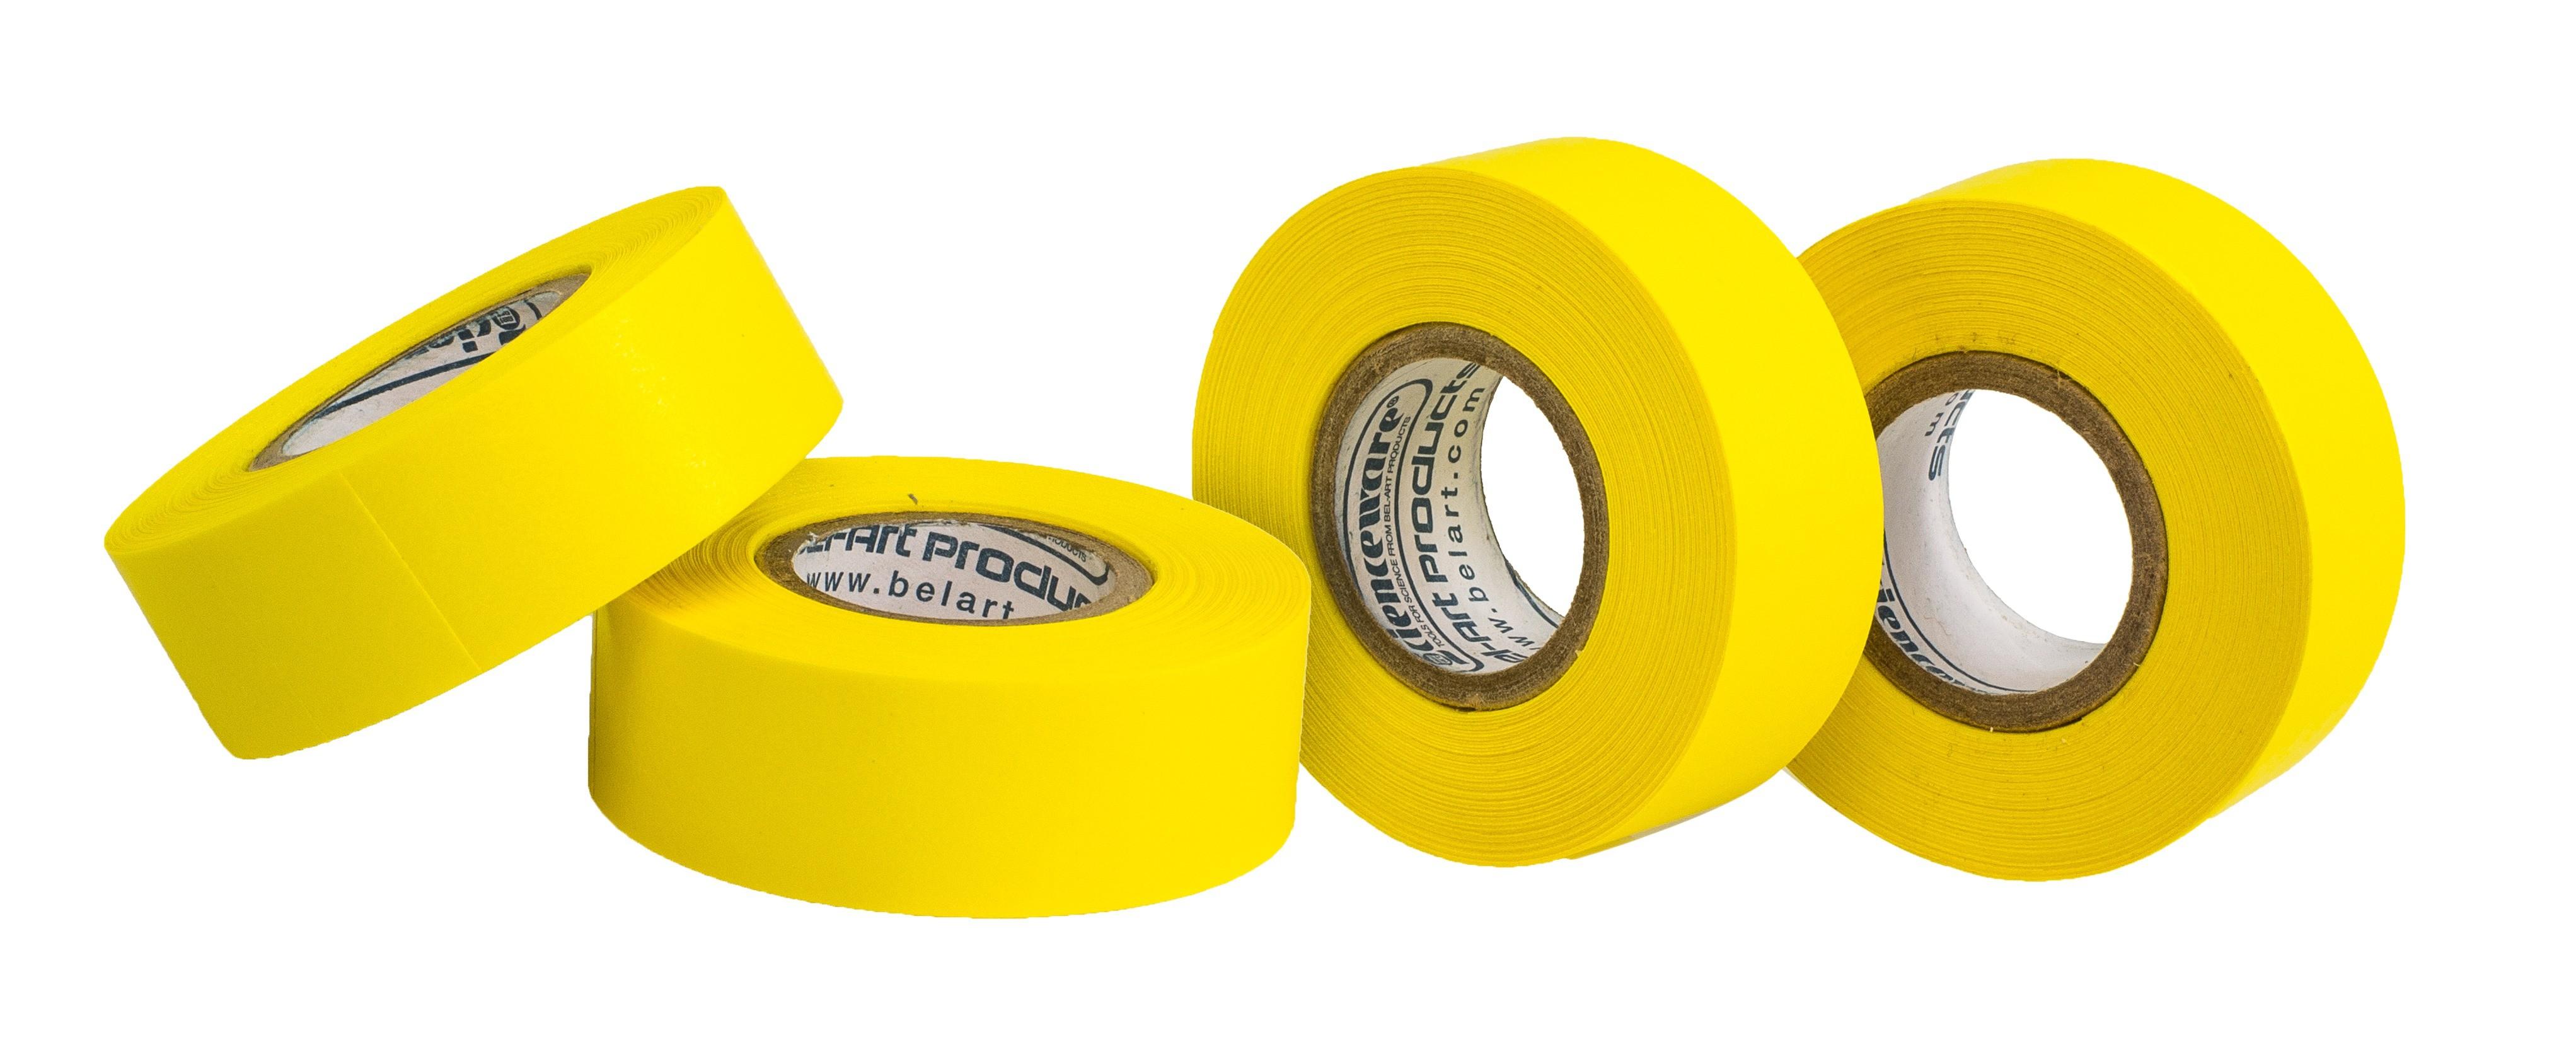 SP Bel-Art Write-On Yellow Label Tape; 15yd Length, ³/₄ in. Width, 1 in. Core (Pack of 4)